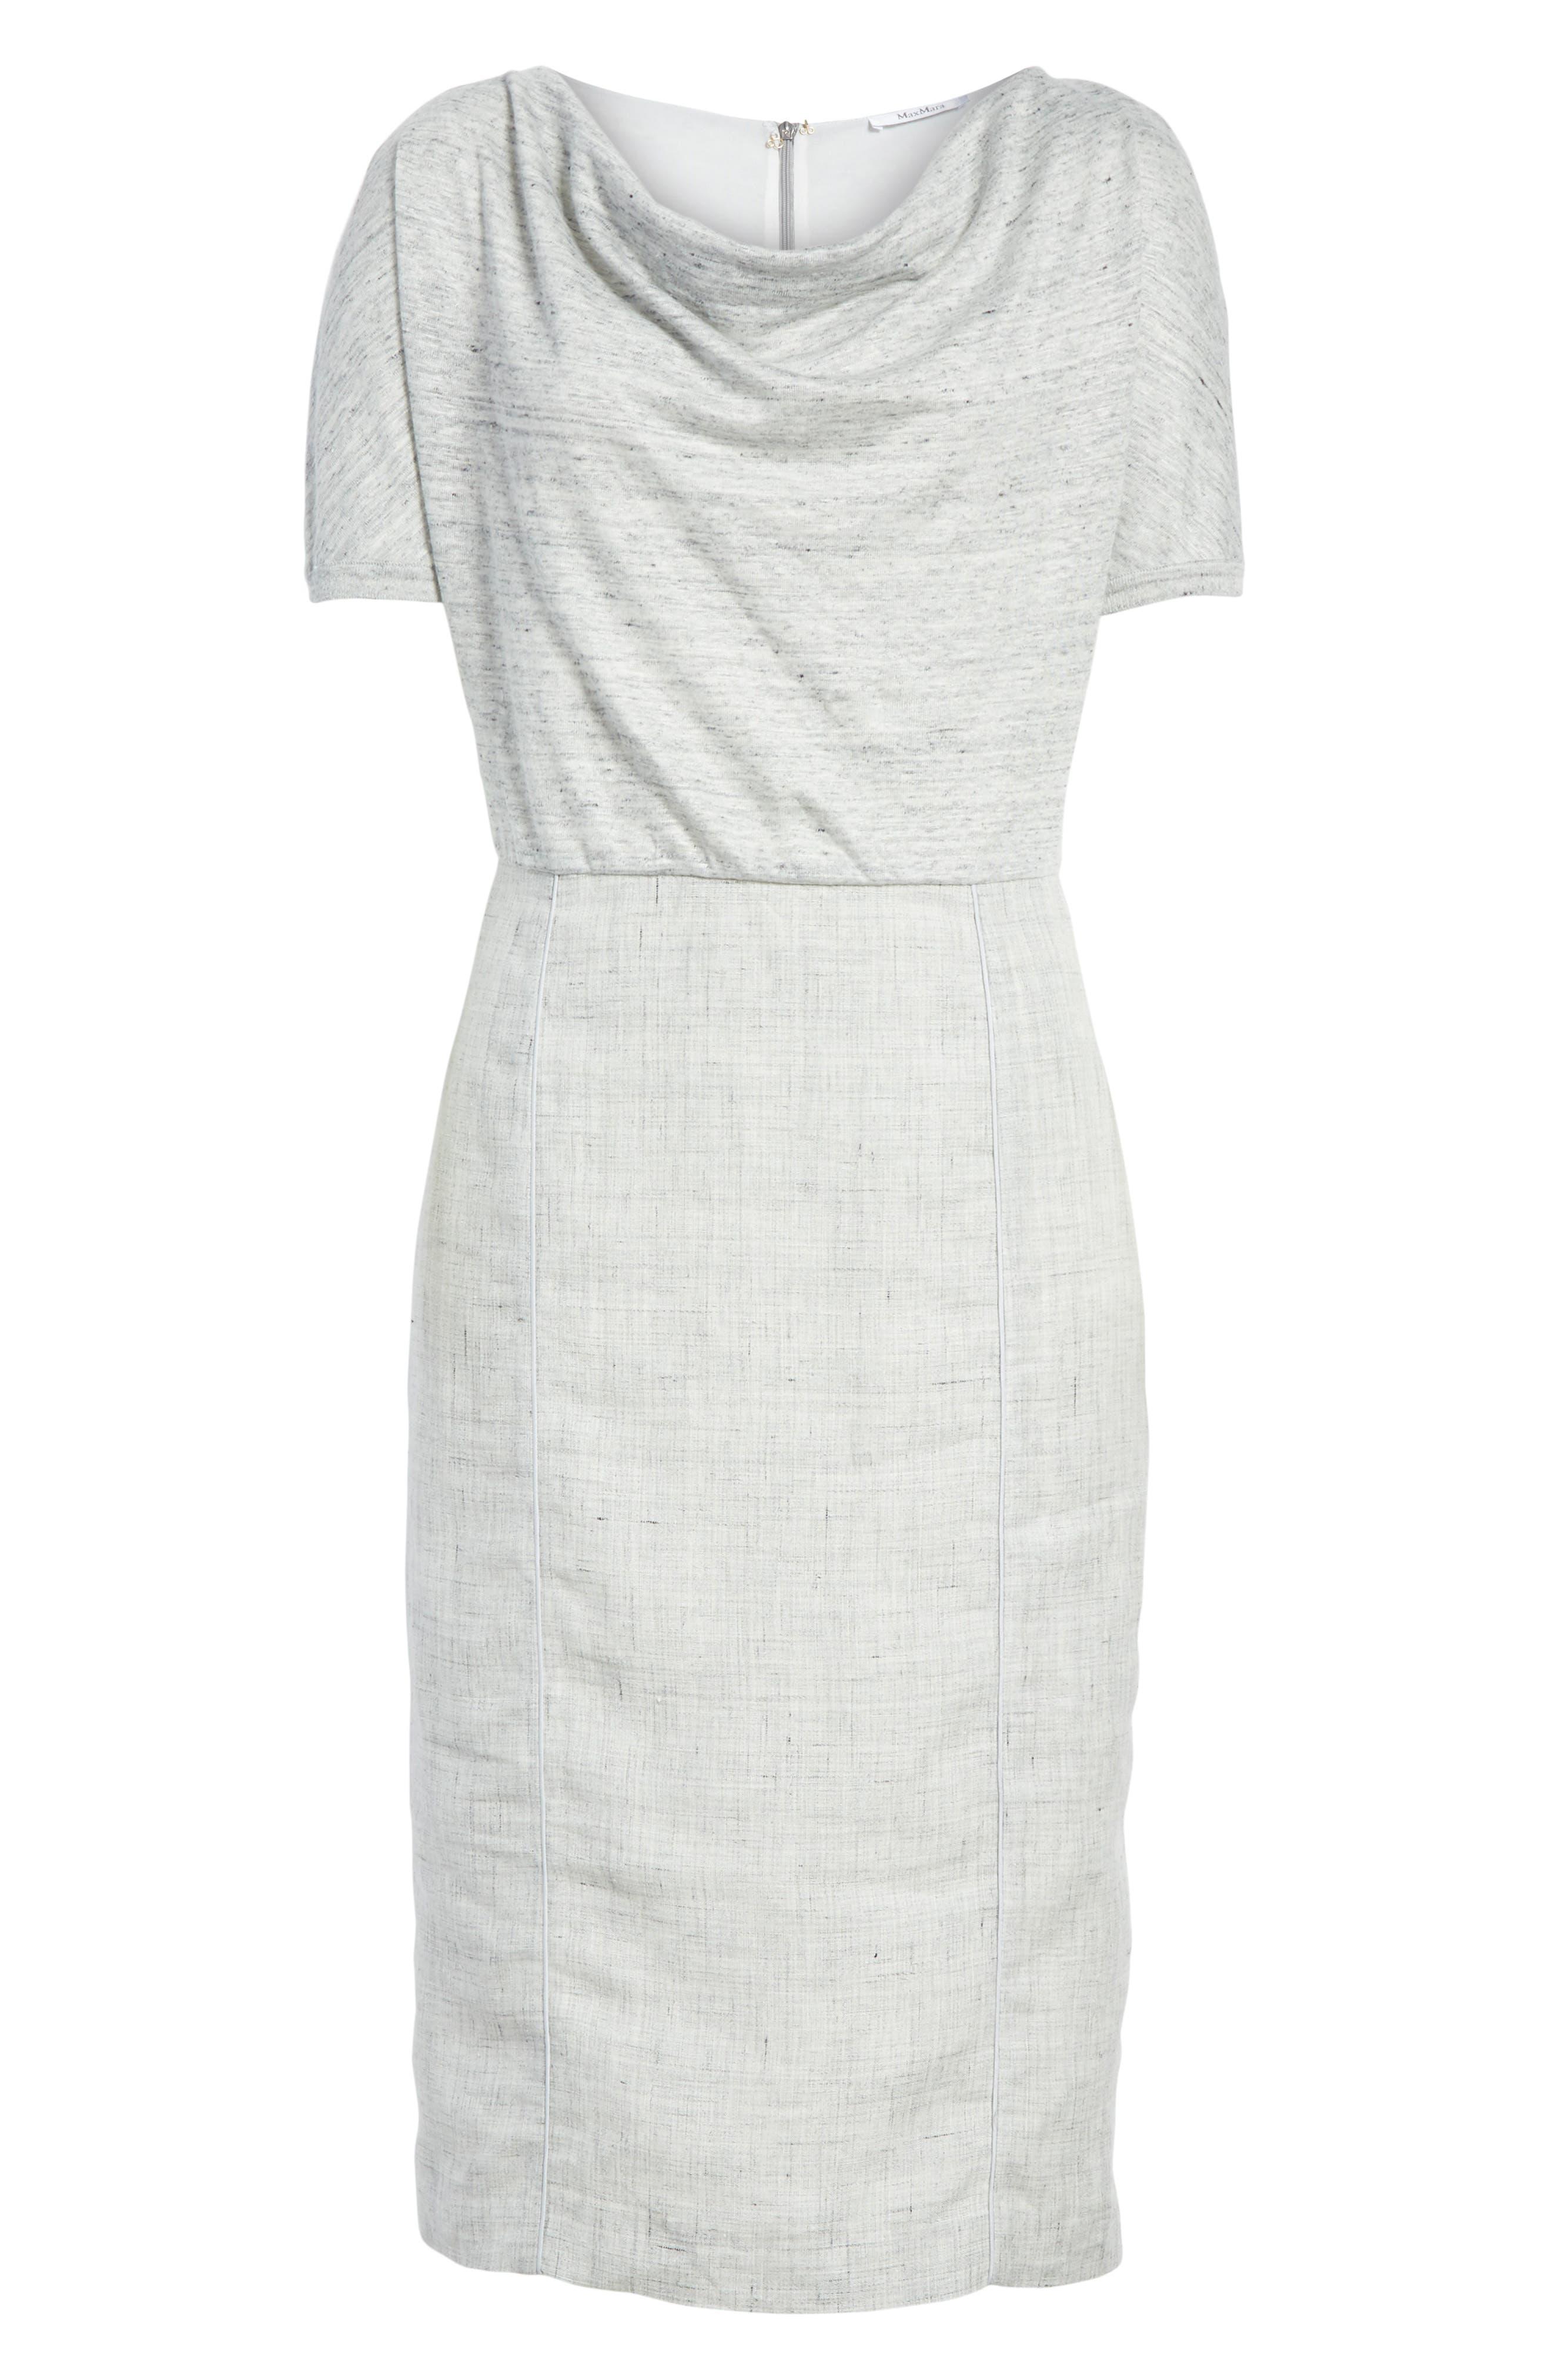 Laura Cowl Neck Linen Dress,                             Alternate thumbnail 6, color,                             Light Grey